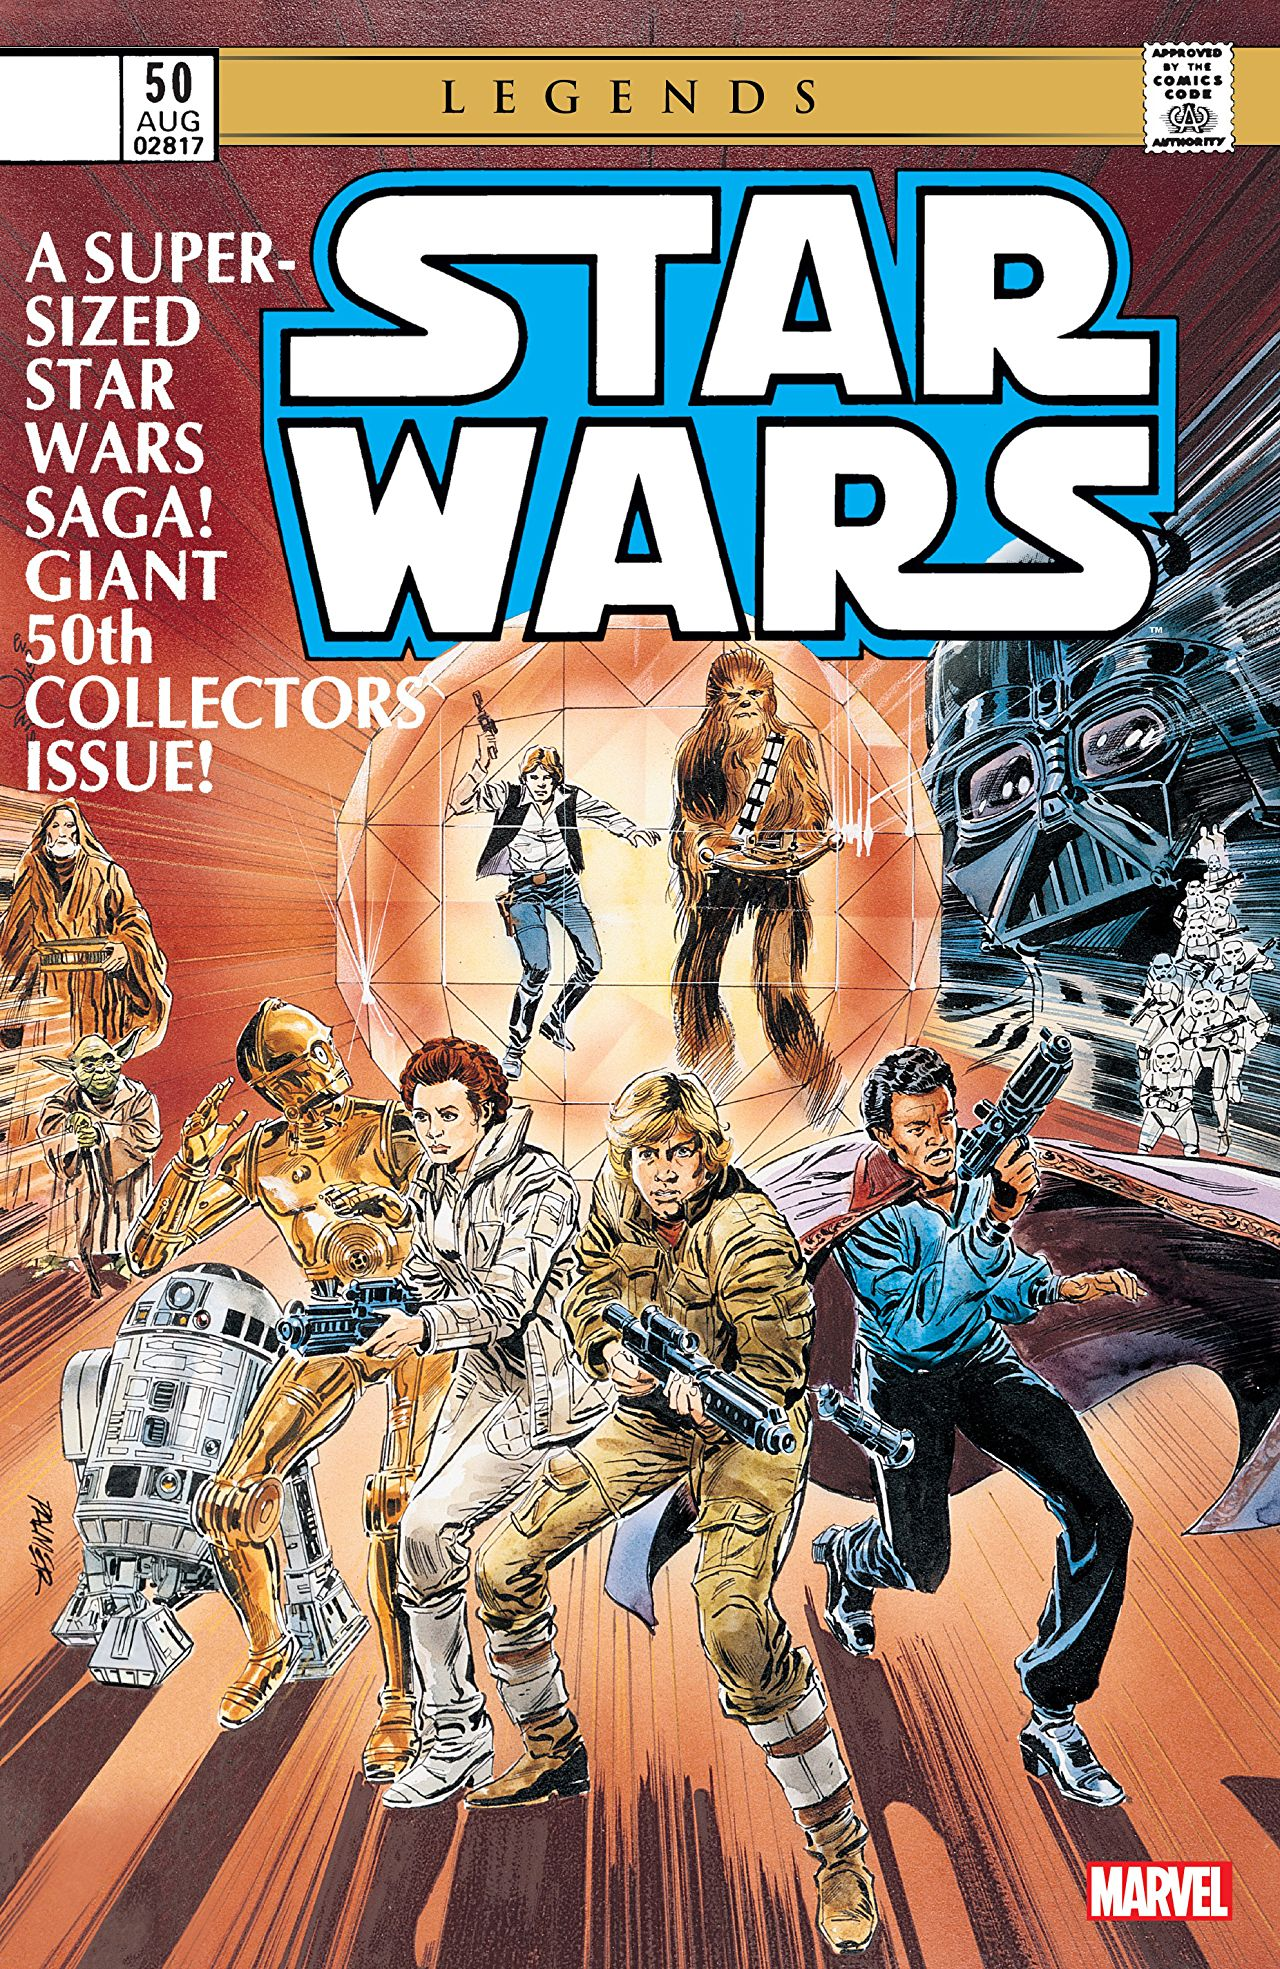 STAR WARS ORIGINAL MARVEL YEARS #108 ACTION FIGURE VARIANT VALANCE COMIC BOOK